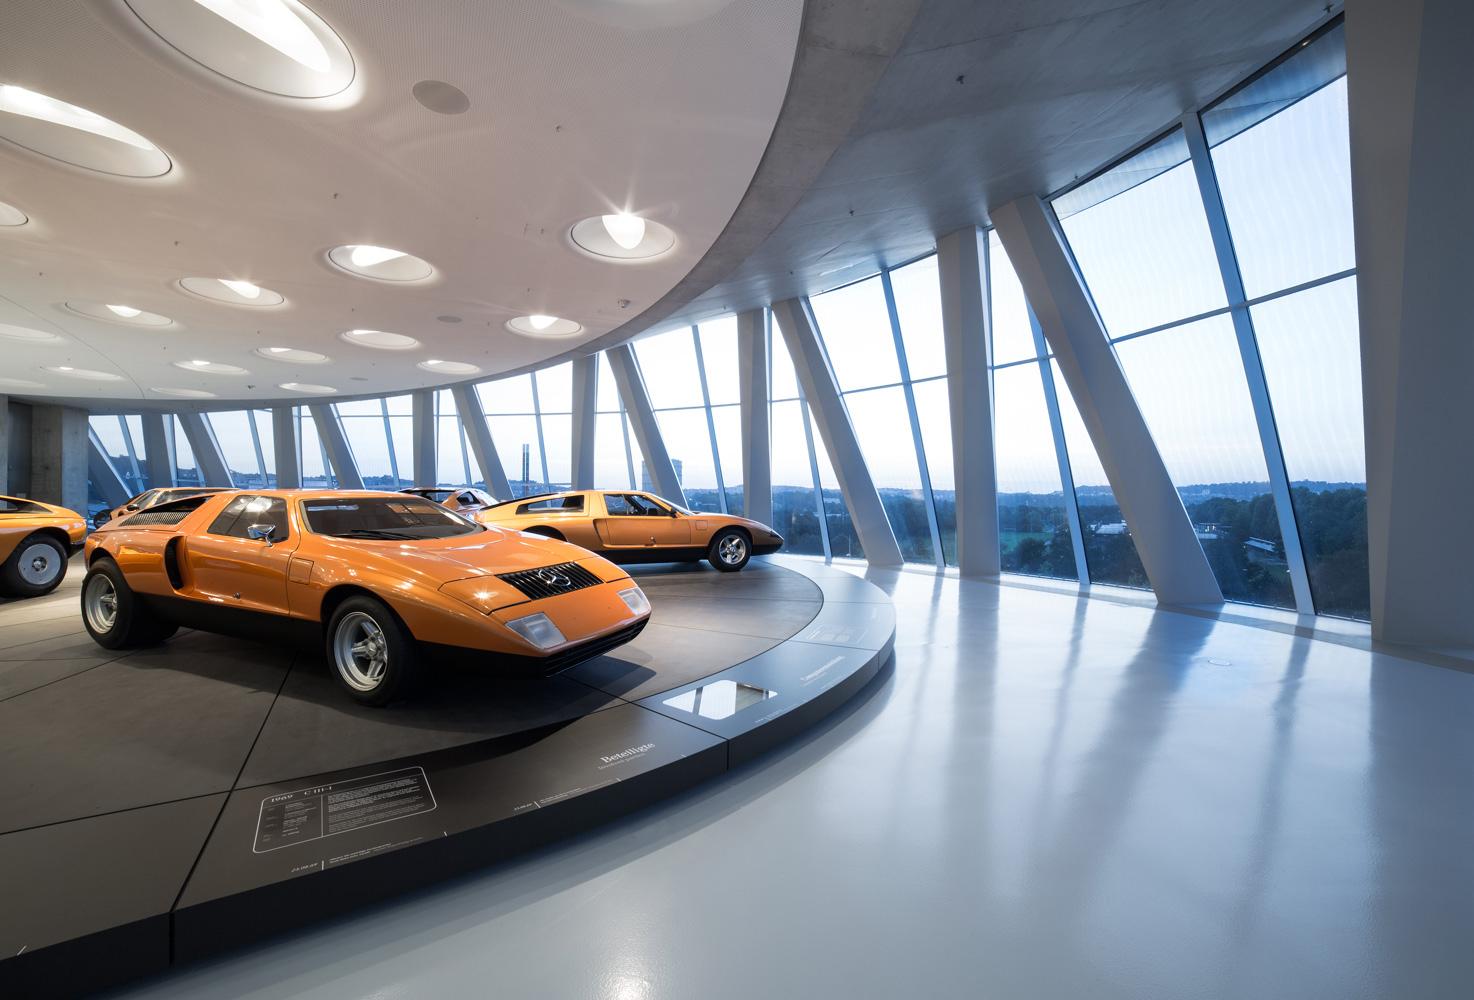 Mercedes-Benz C111, Exhibition